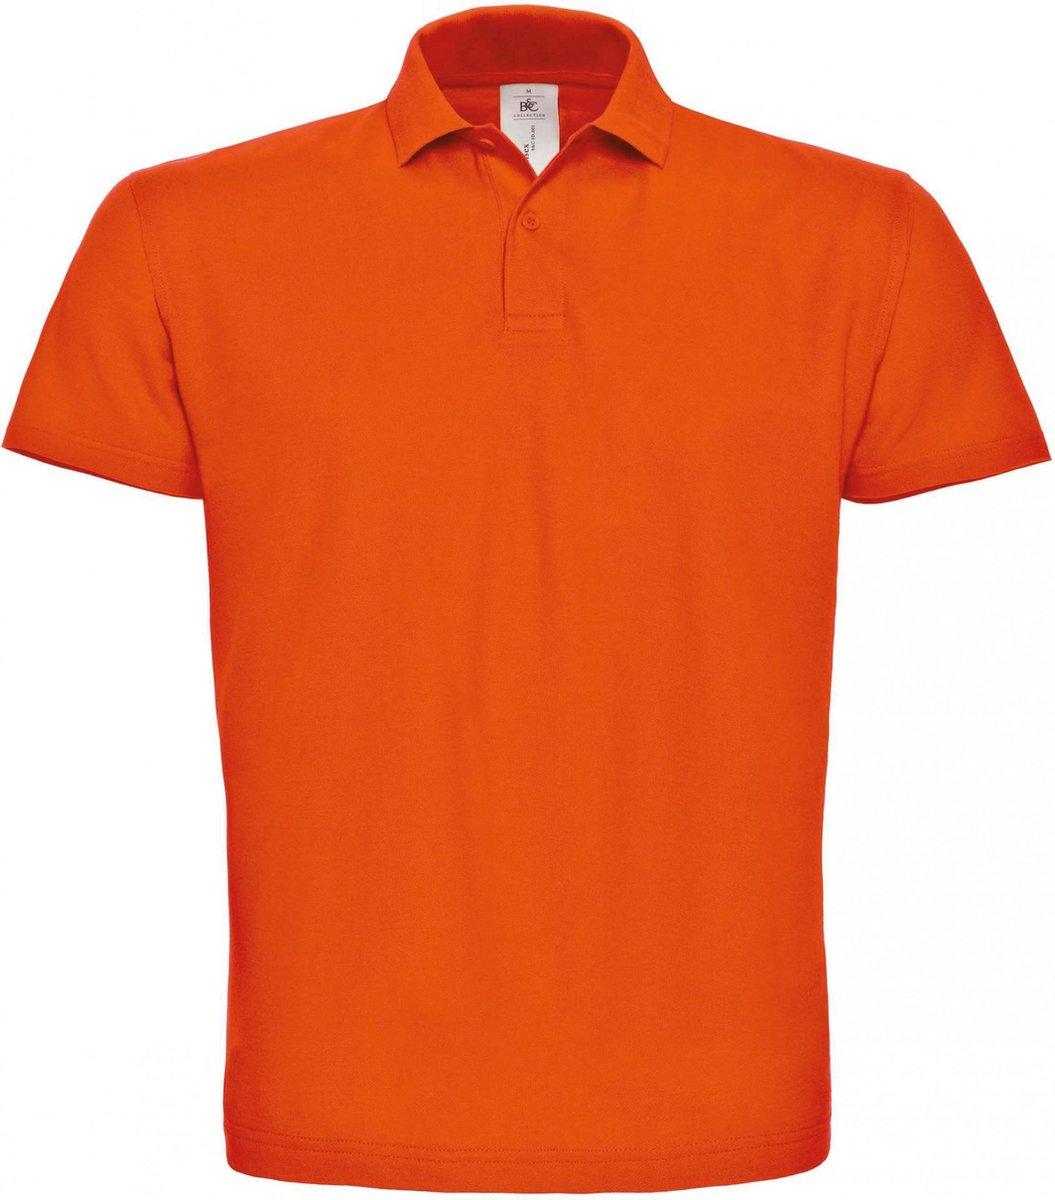 B&C Heren Oranje Polo REGULAR FIT Maat XXL 100 % Katoen